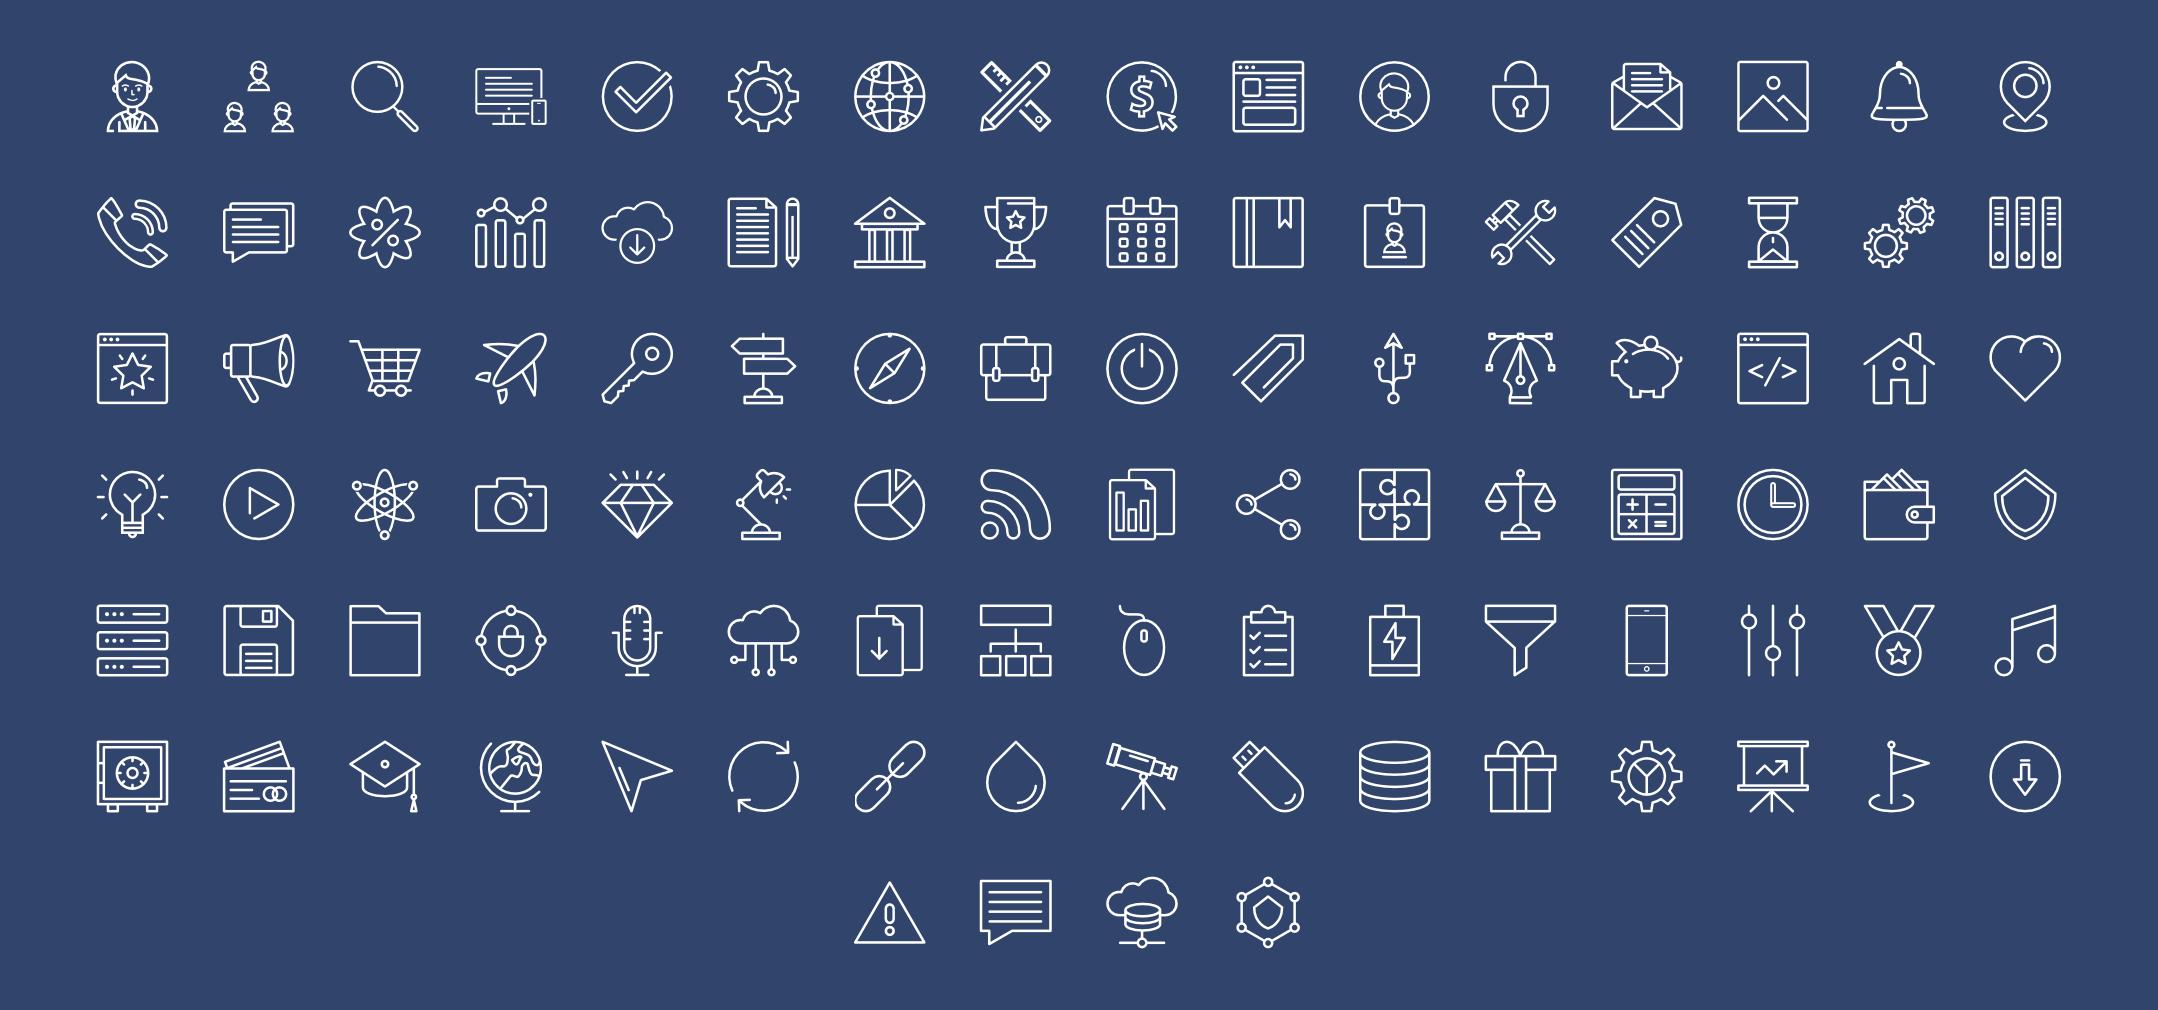 ThemeIsle free icons pack.